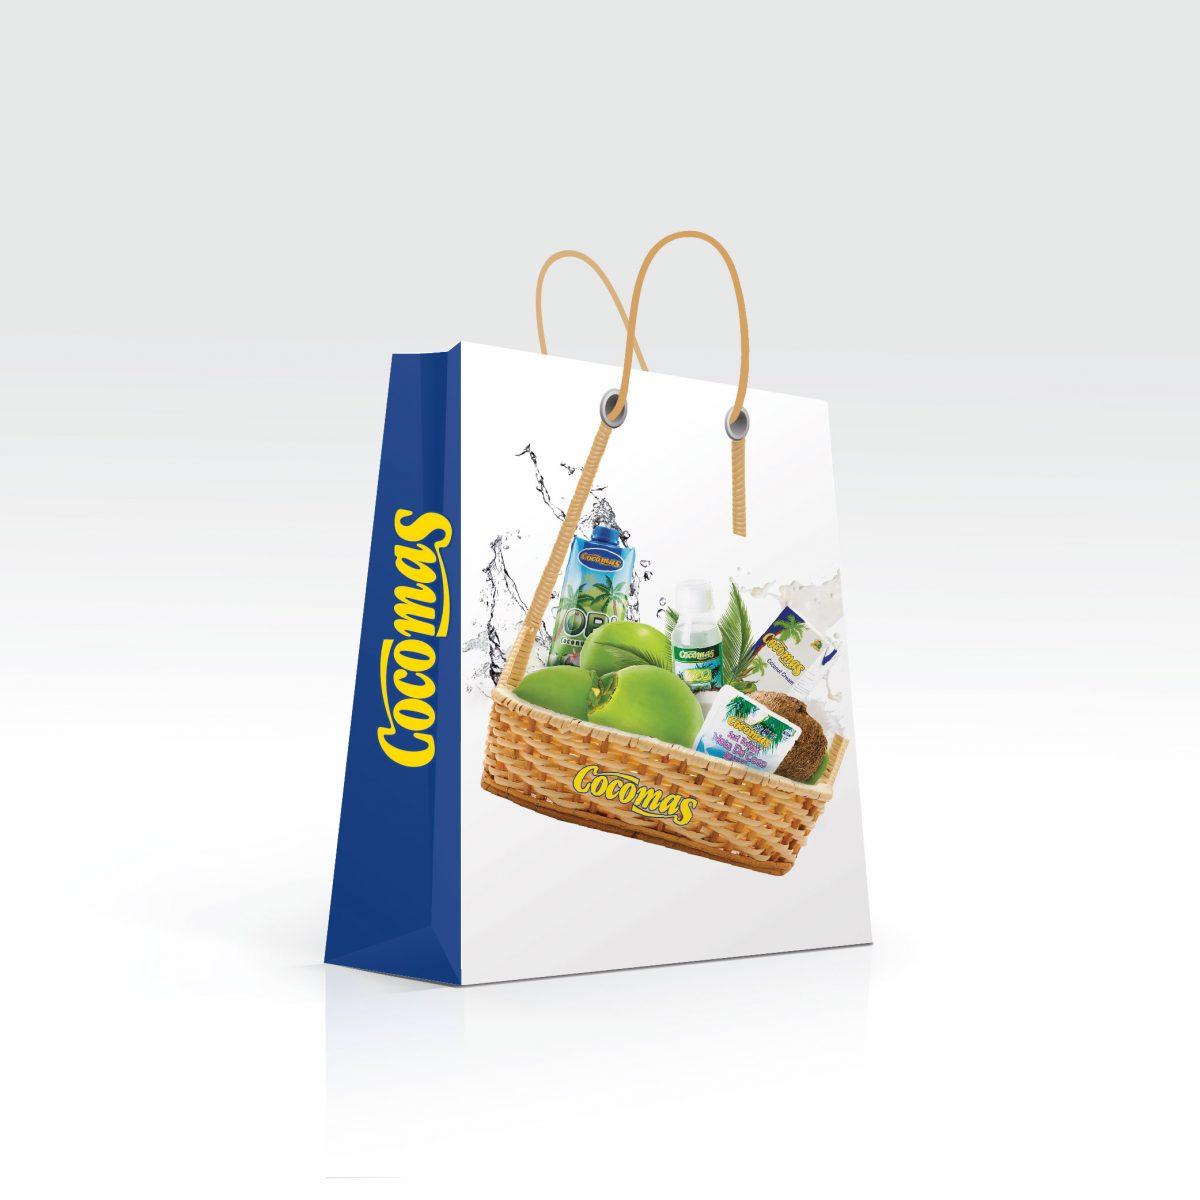 Product Packaging Design (Paper Bag)